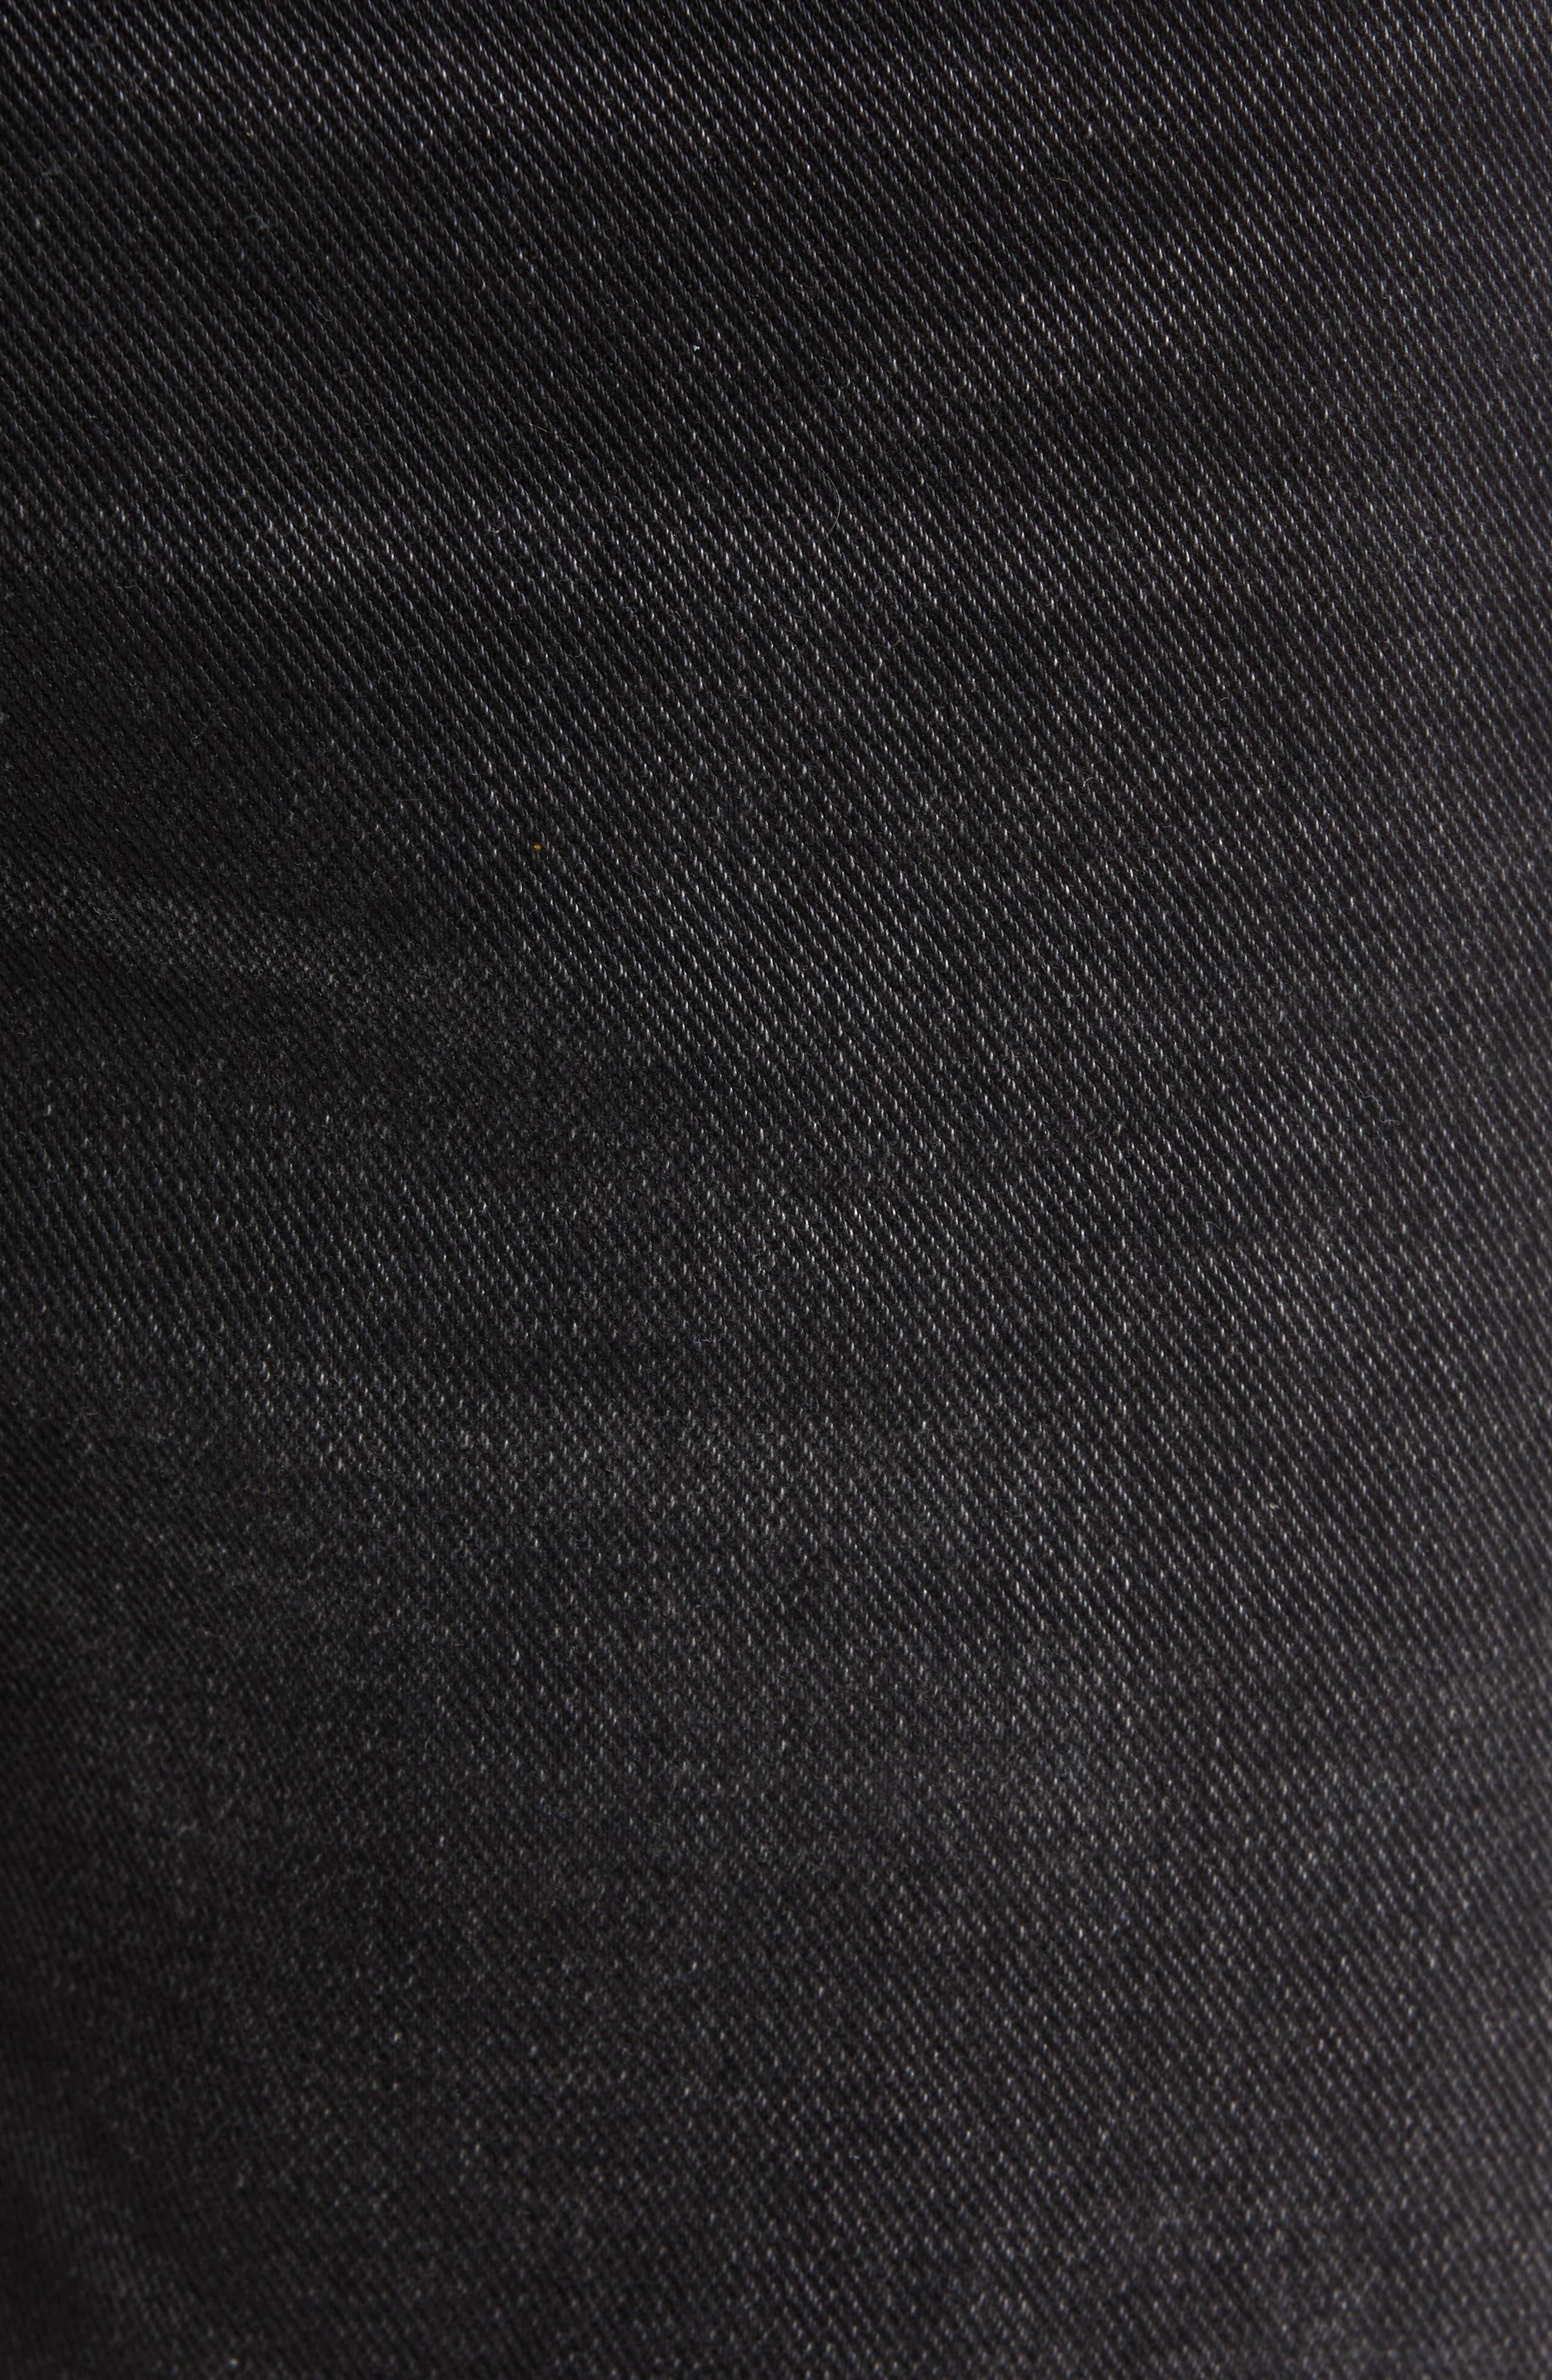 Dillon Straight Leg Jeans,                             Alternate thumbnail 5, color,                             001